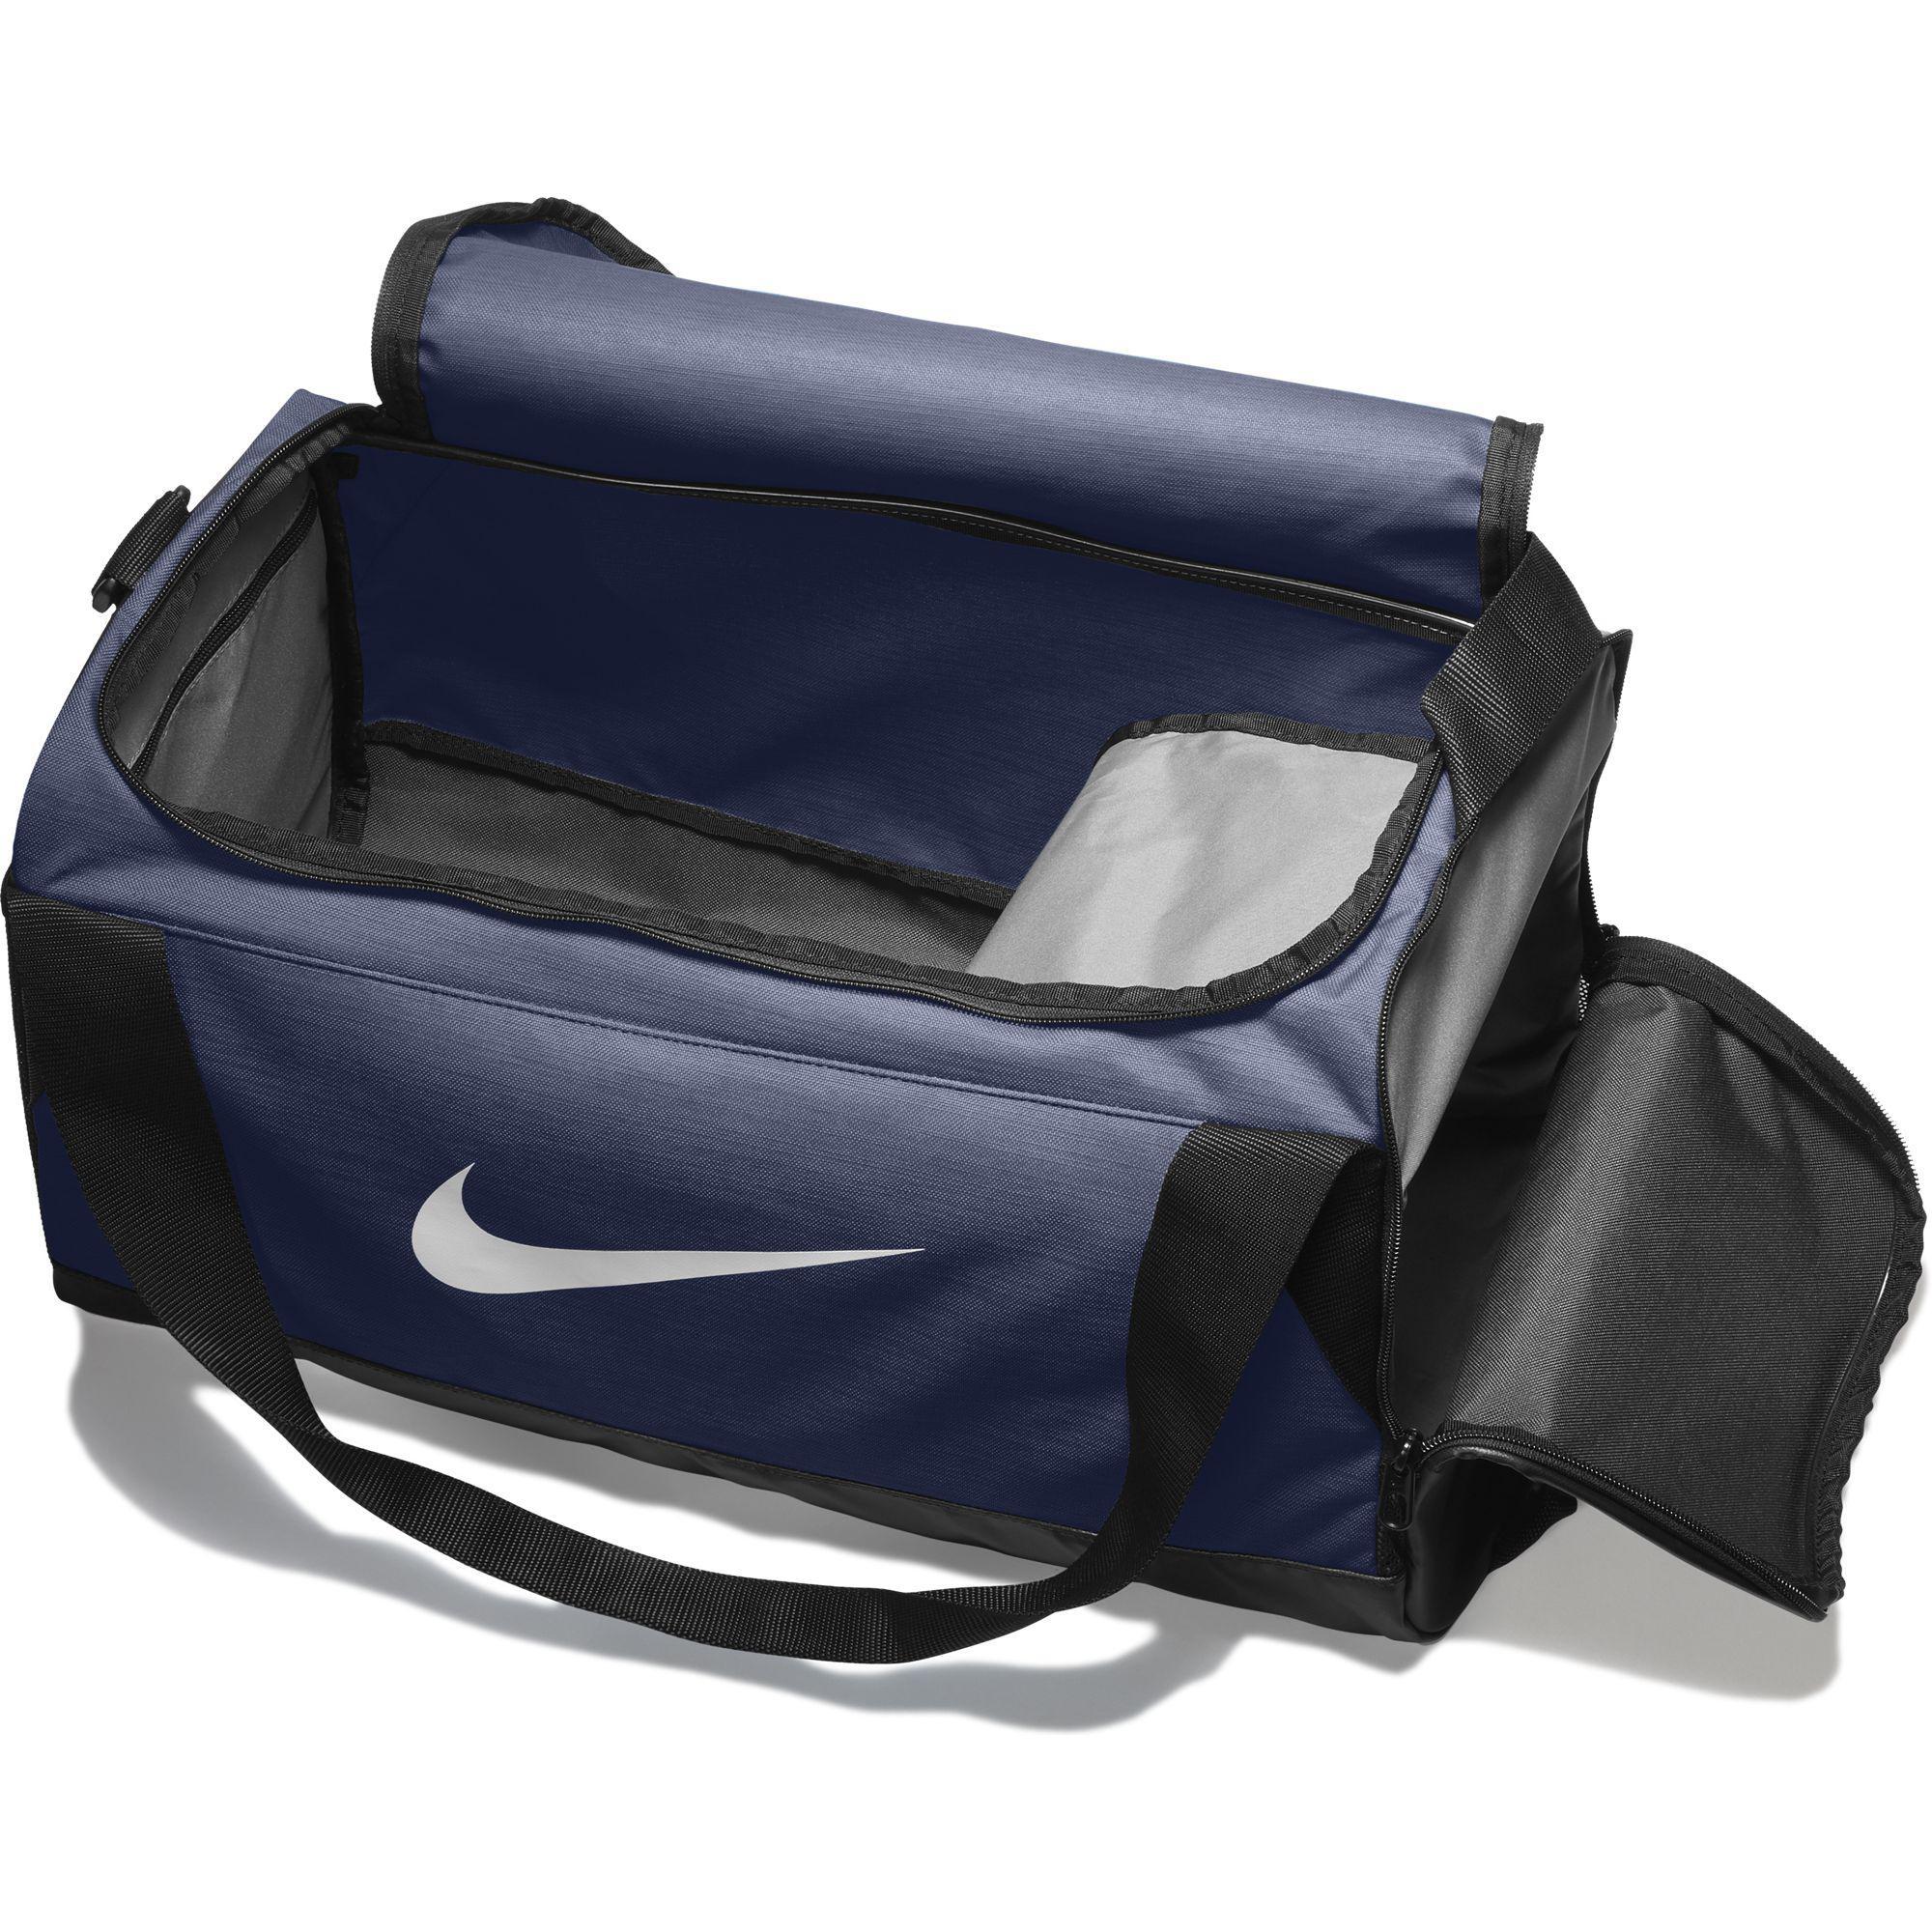 Nike Vapor Max Air Training Duffel Bag - Medium - Bags ... |Nike Dry Bag